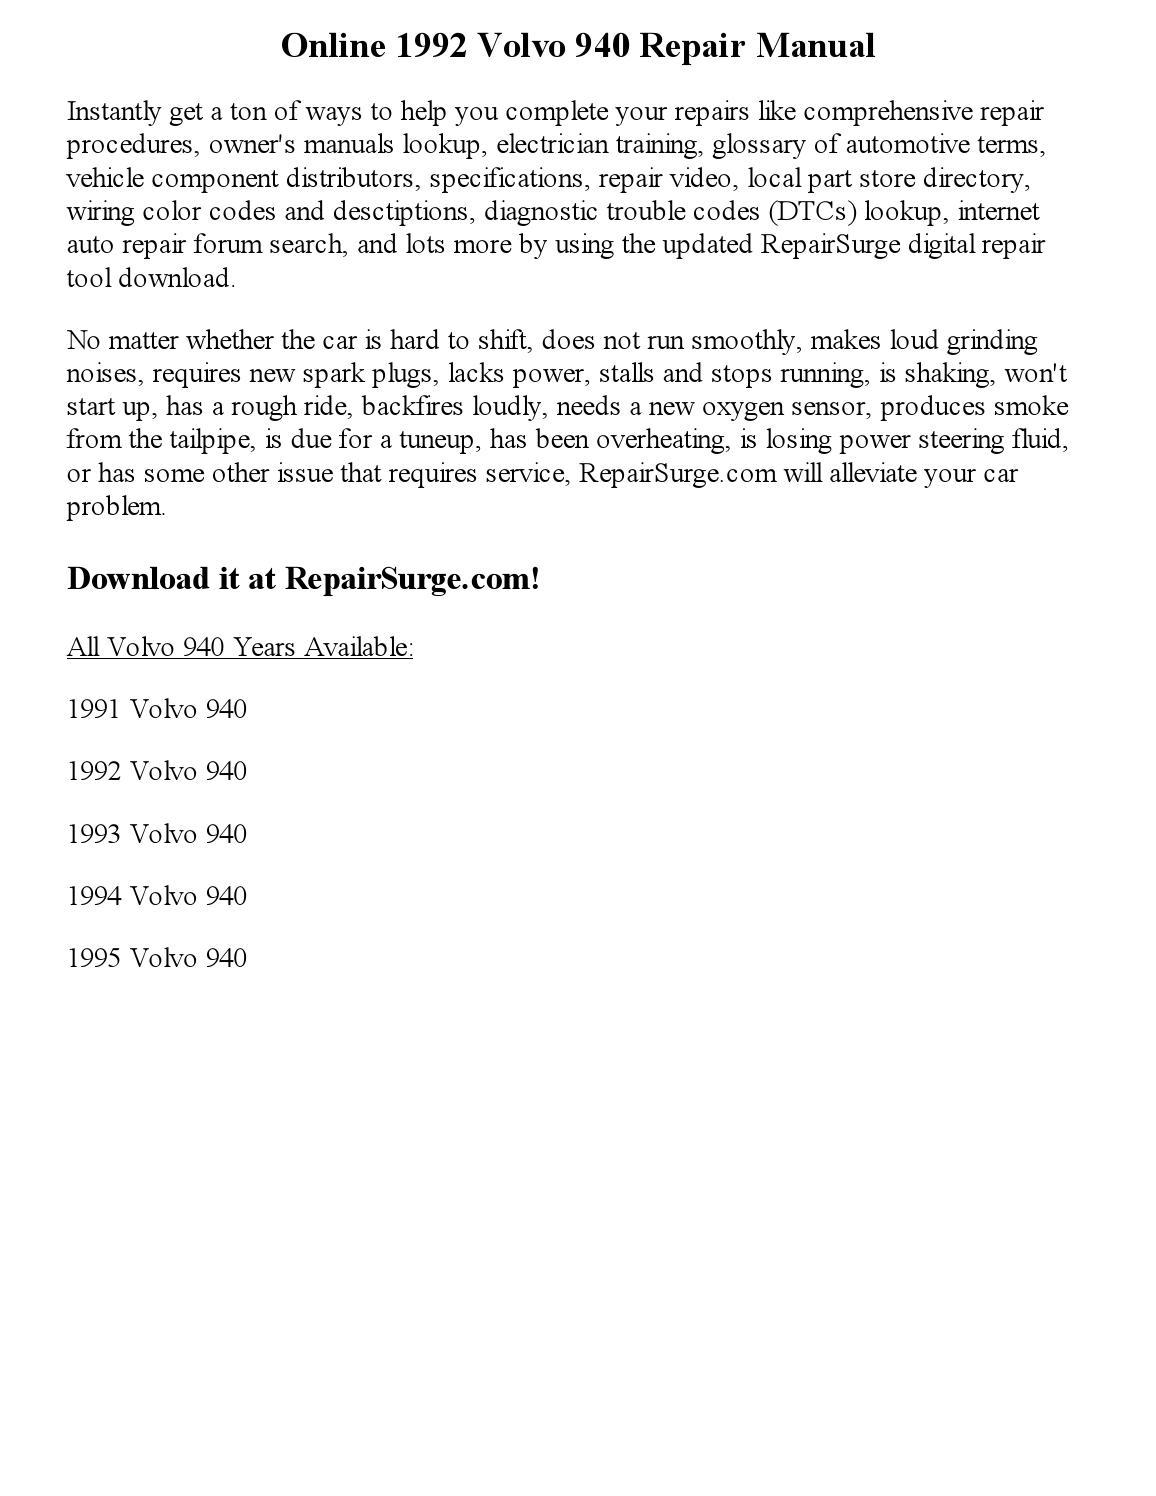 1992 Volvo 940 Repair Manual Online By Sweyer Issuu 1994 Auto Car Wiring Schematic